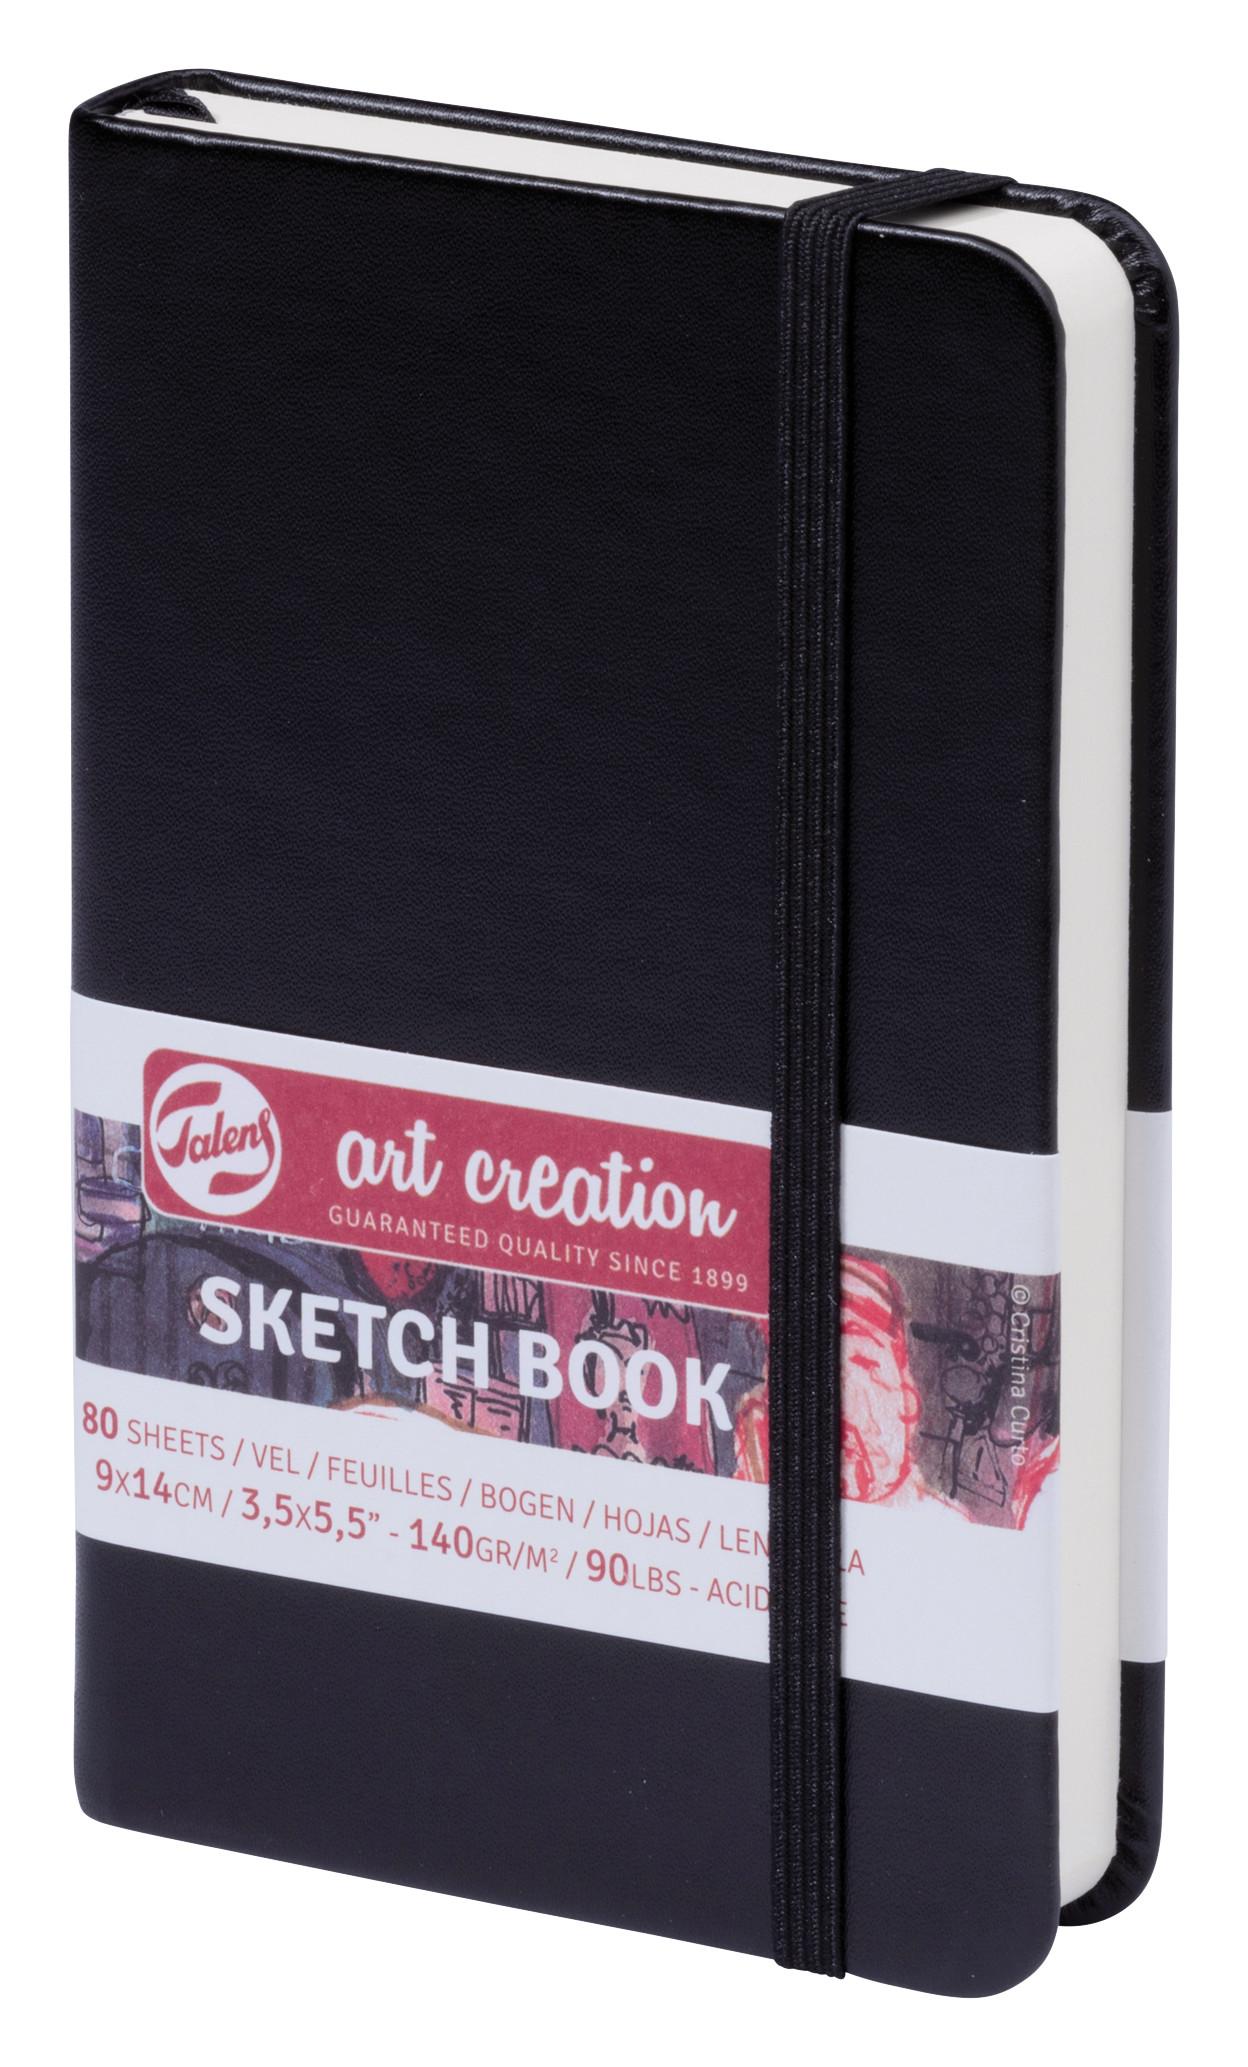 Talens Art Creation Sketchbook Black 9X14 cm, 140 Grams